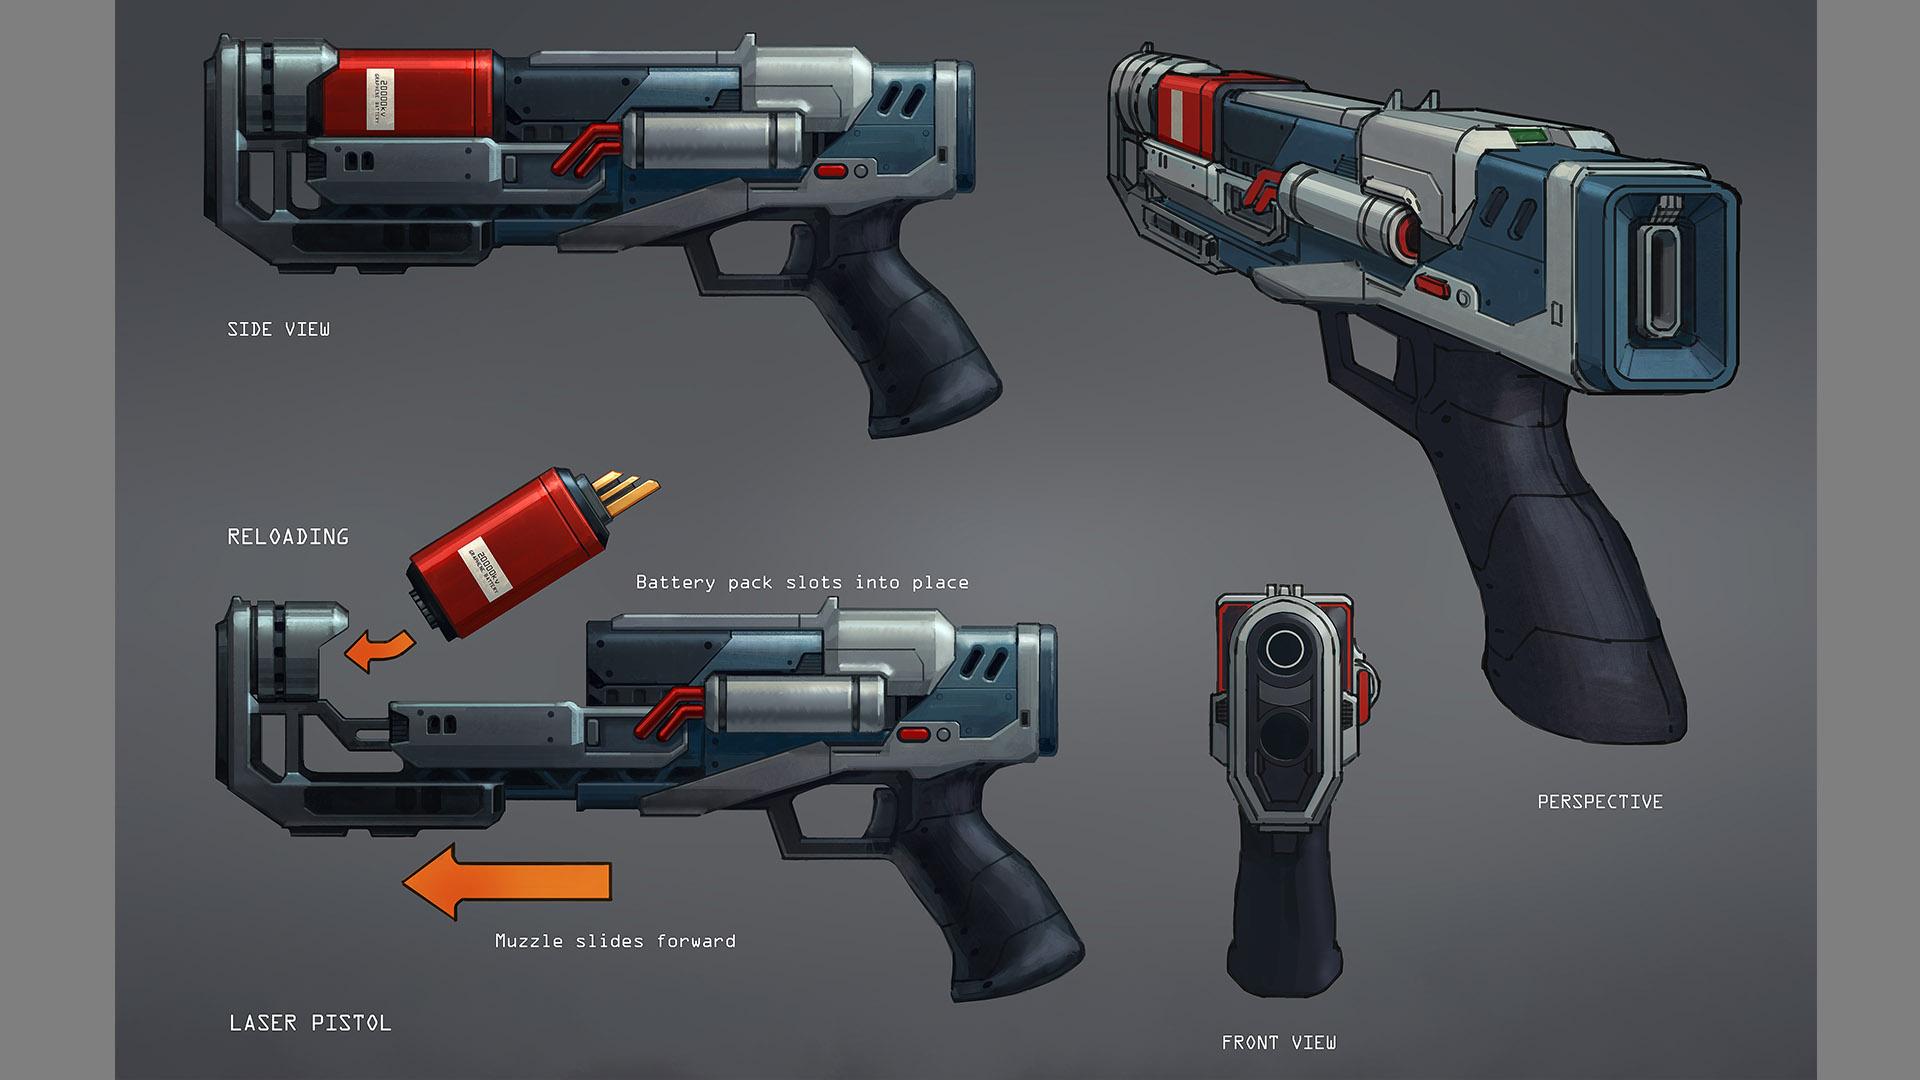 laser pistol persp